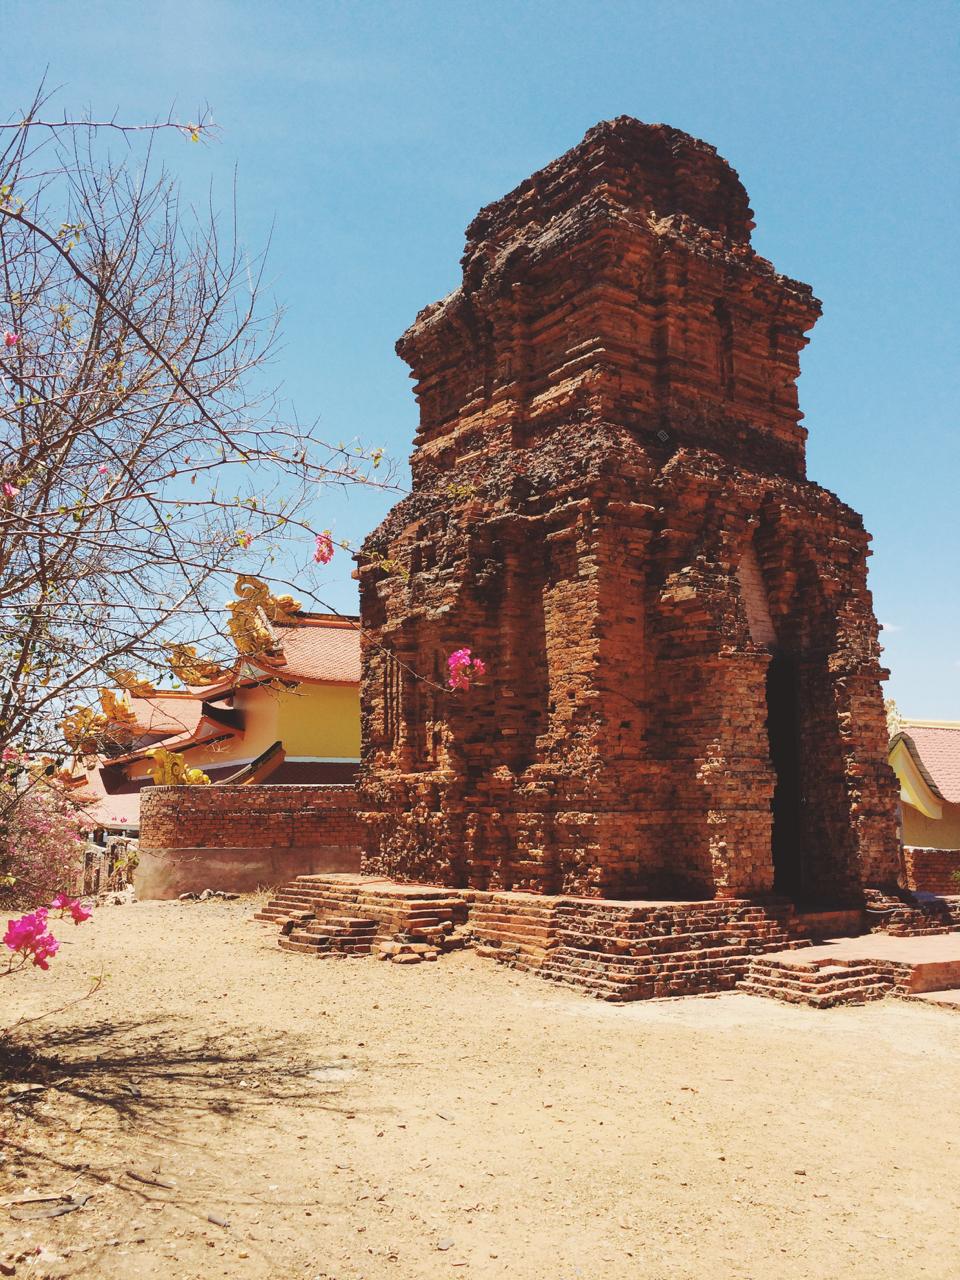 Путешествие по Вьетнаму, Муйне: башня Пошану